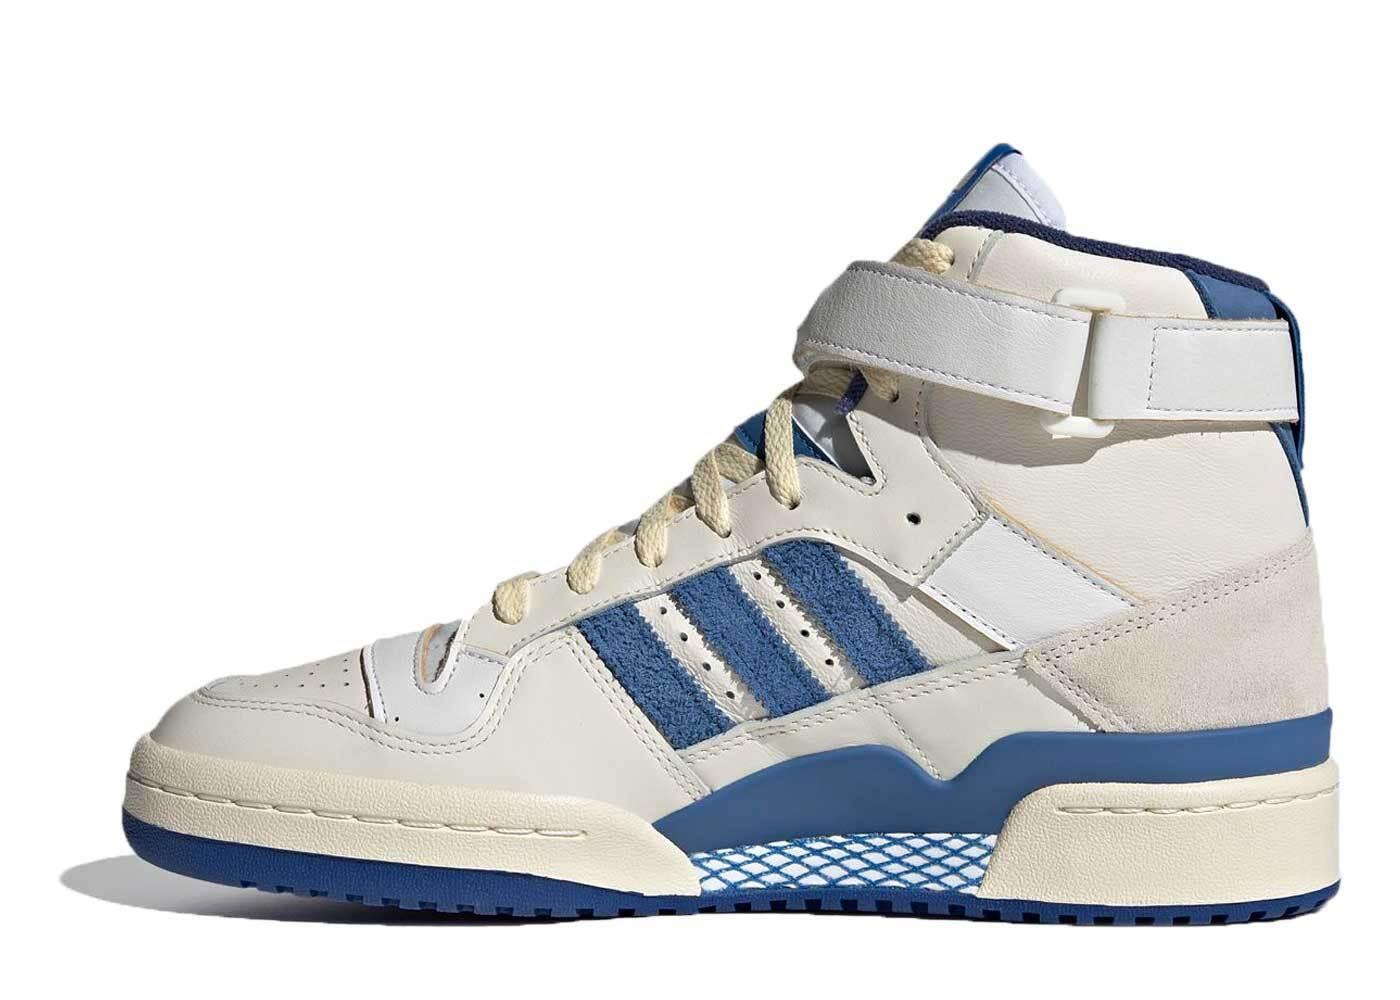 Adidas Forum 84 White Blueの写真